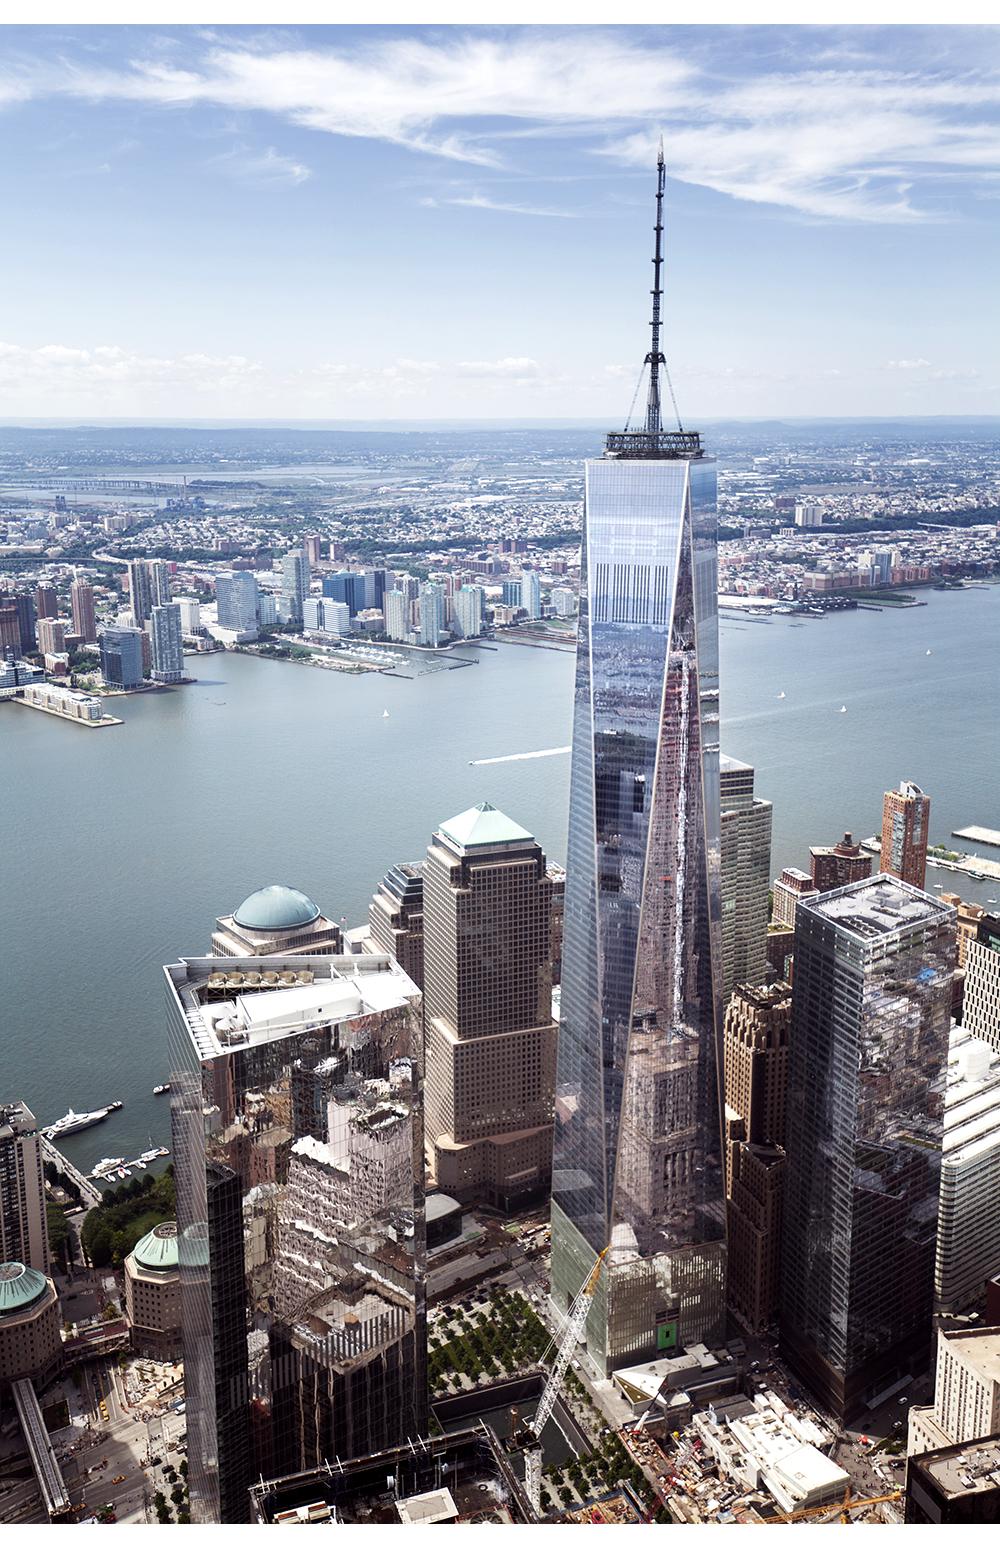 NYC_Heli_02.jpg